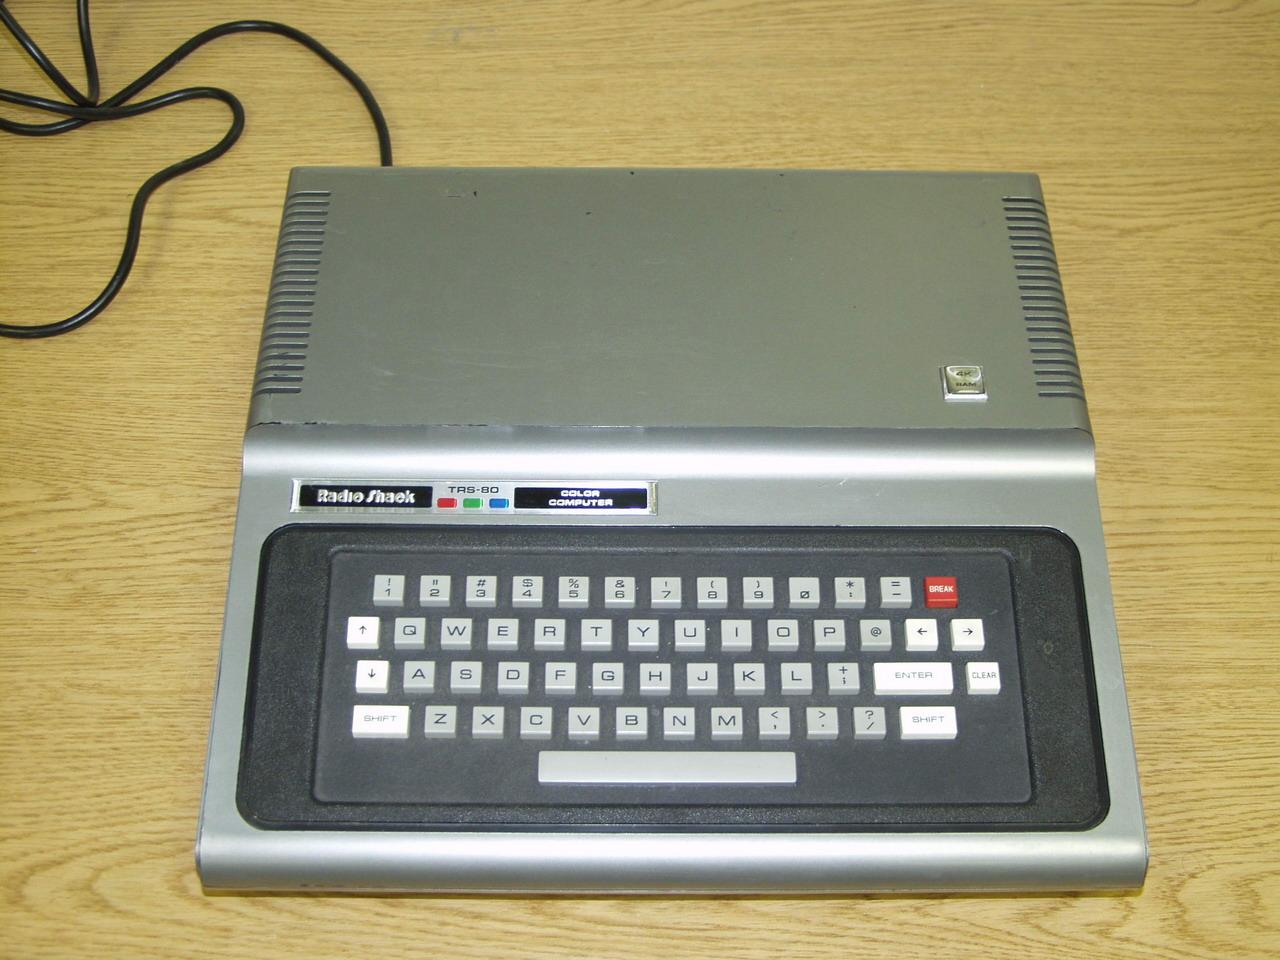 TRS-80_Color_Computer_1.jpg